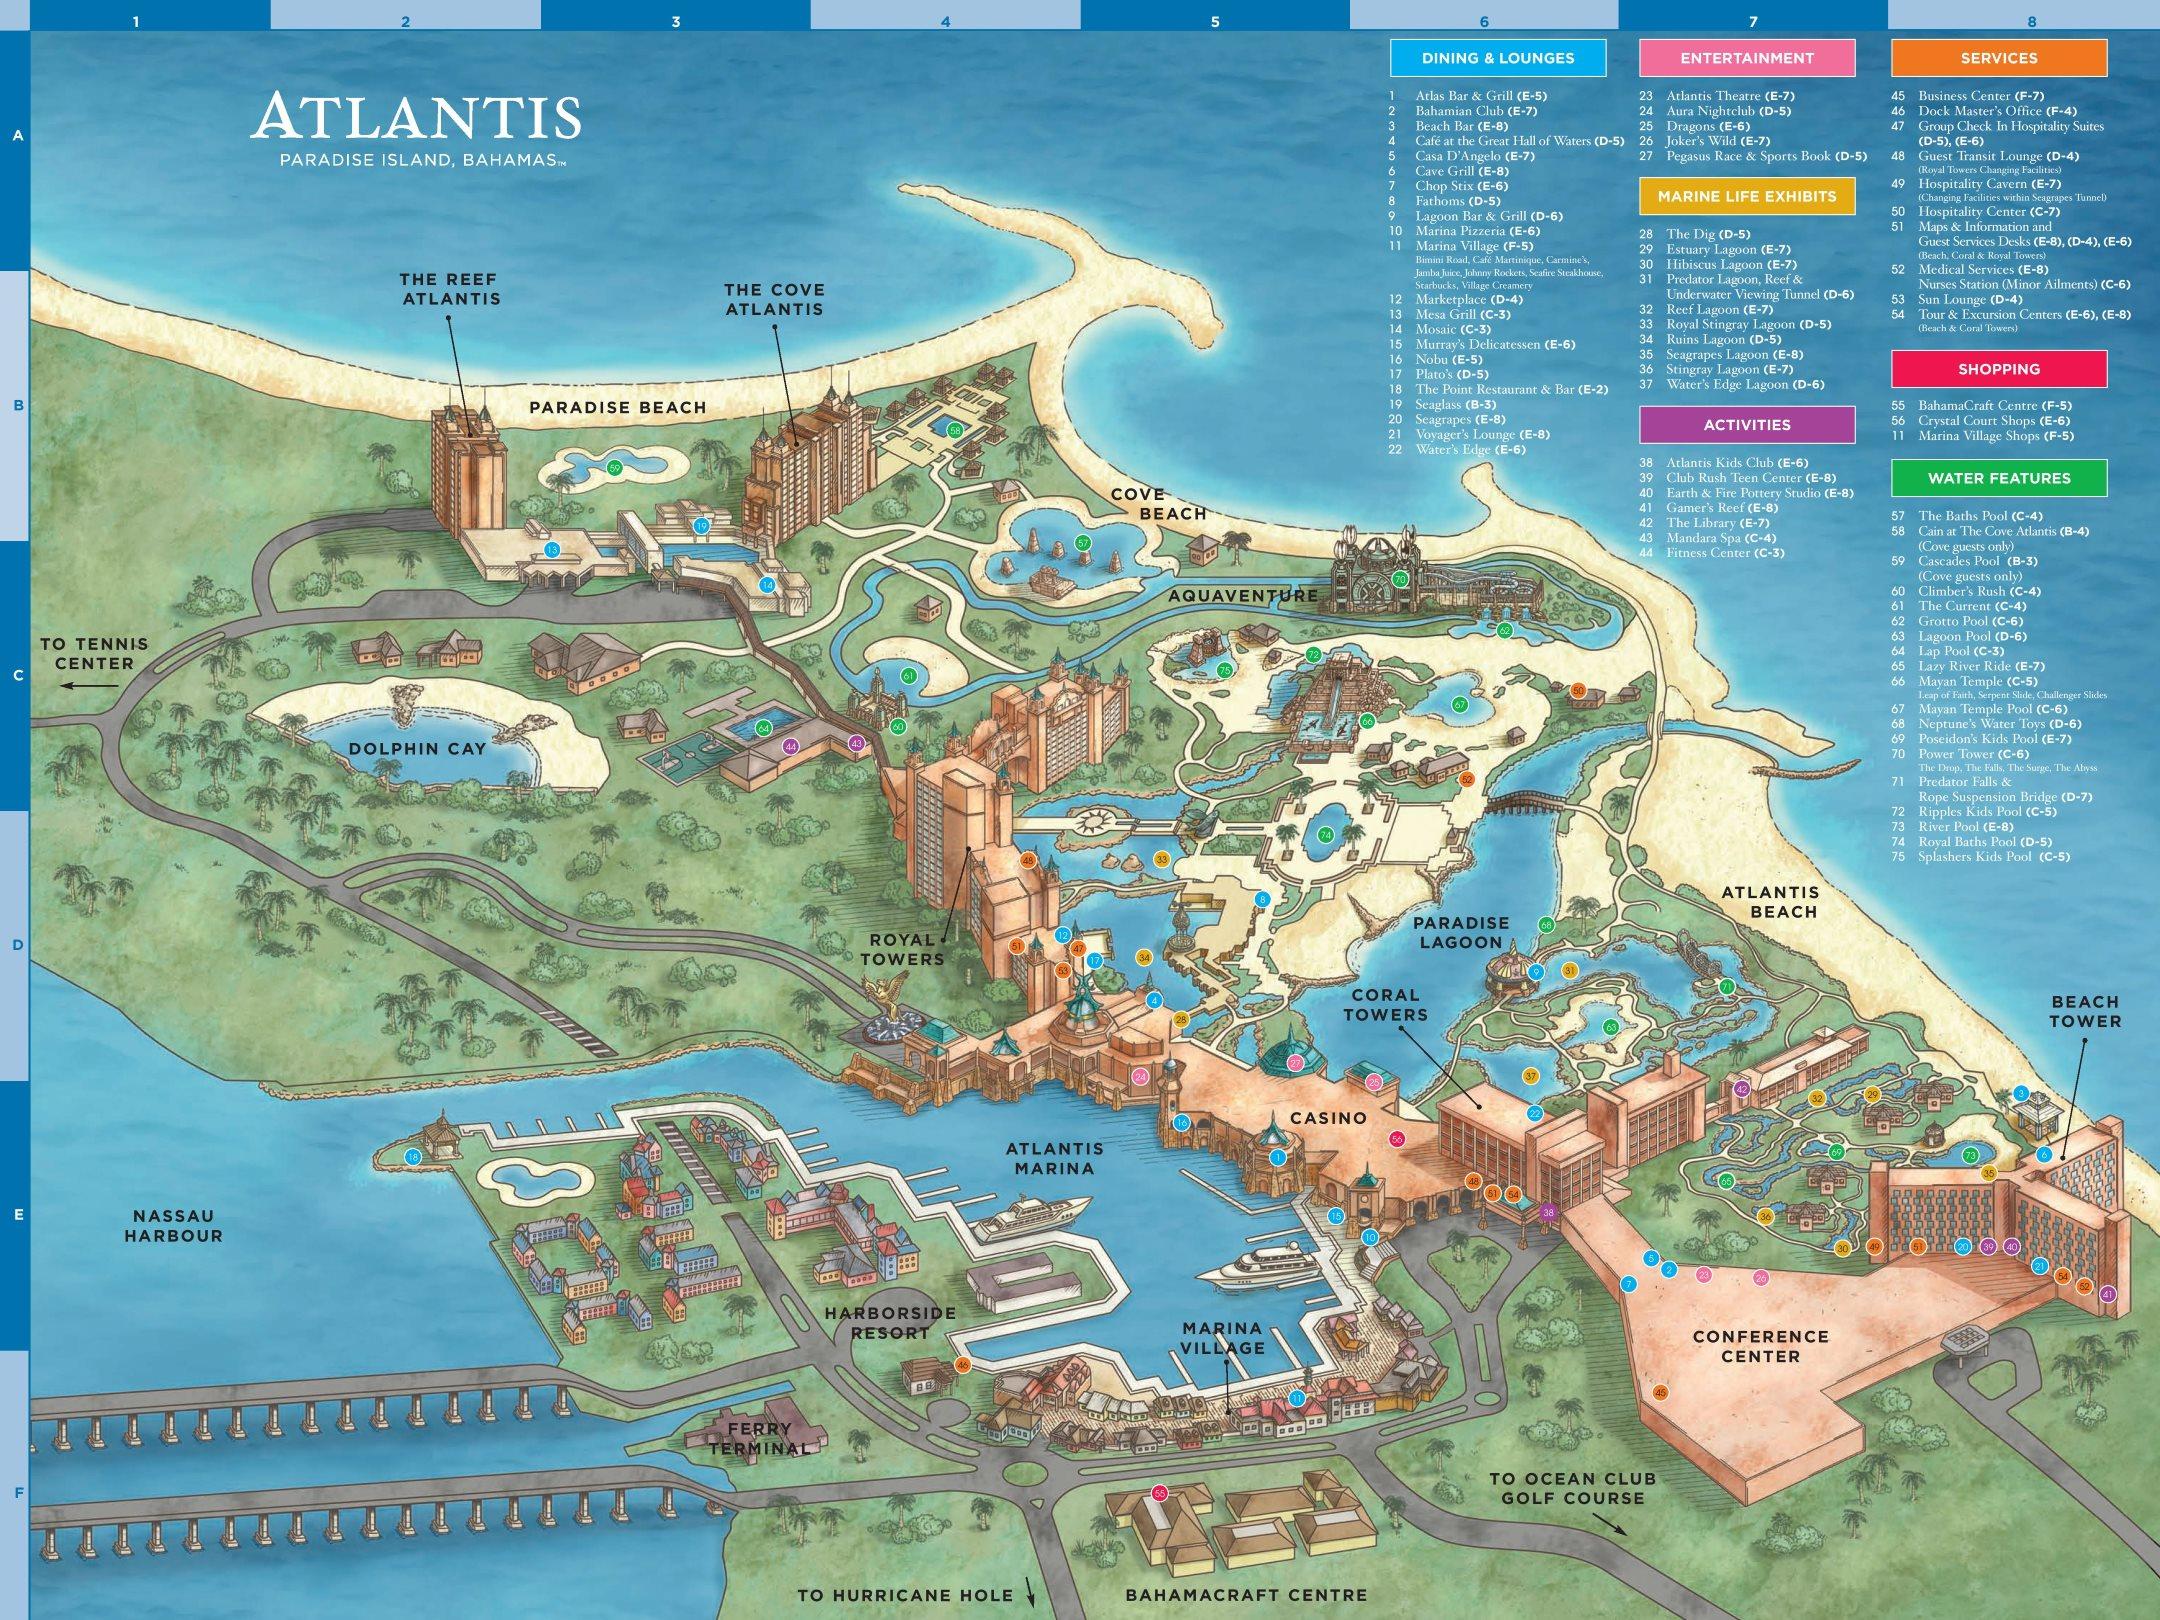 map of paradise island bahamas Atlantis Paradise Island Hotel Overview Map map of paradise island bahamas